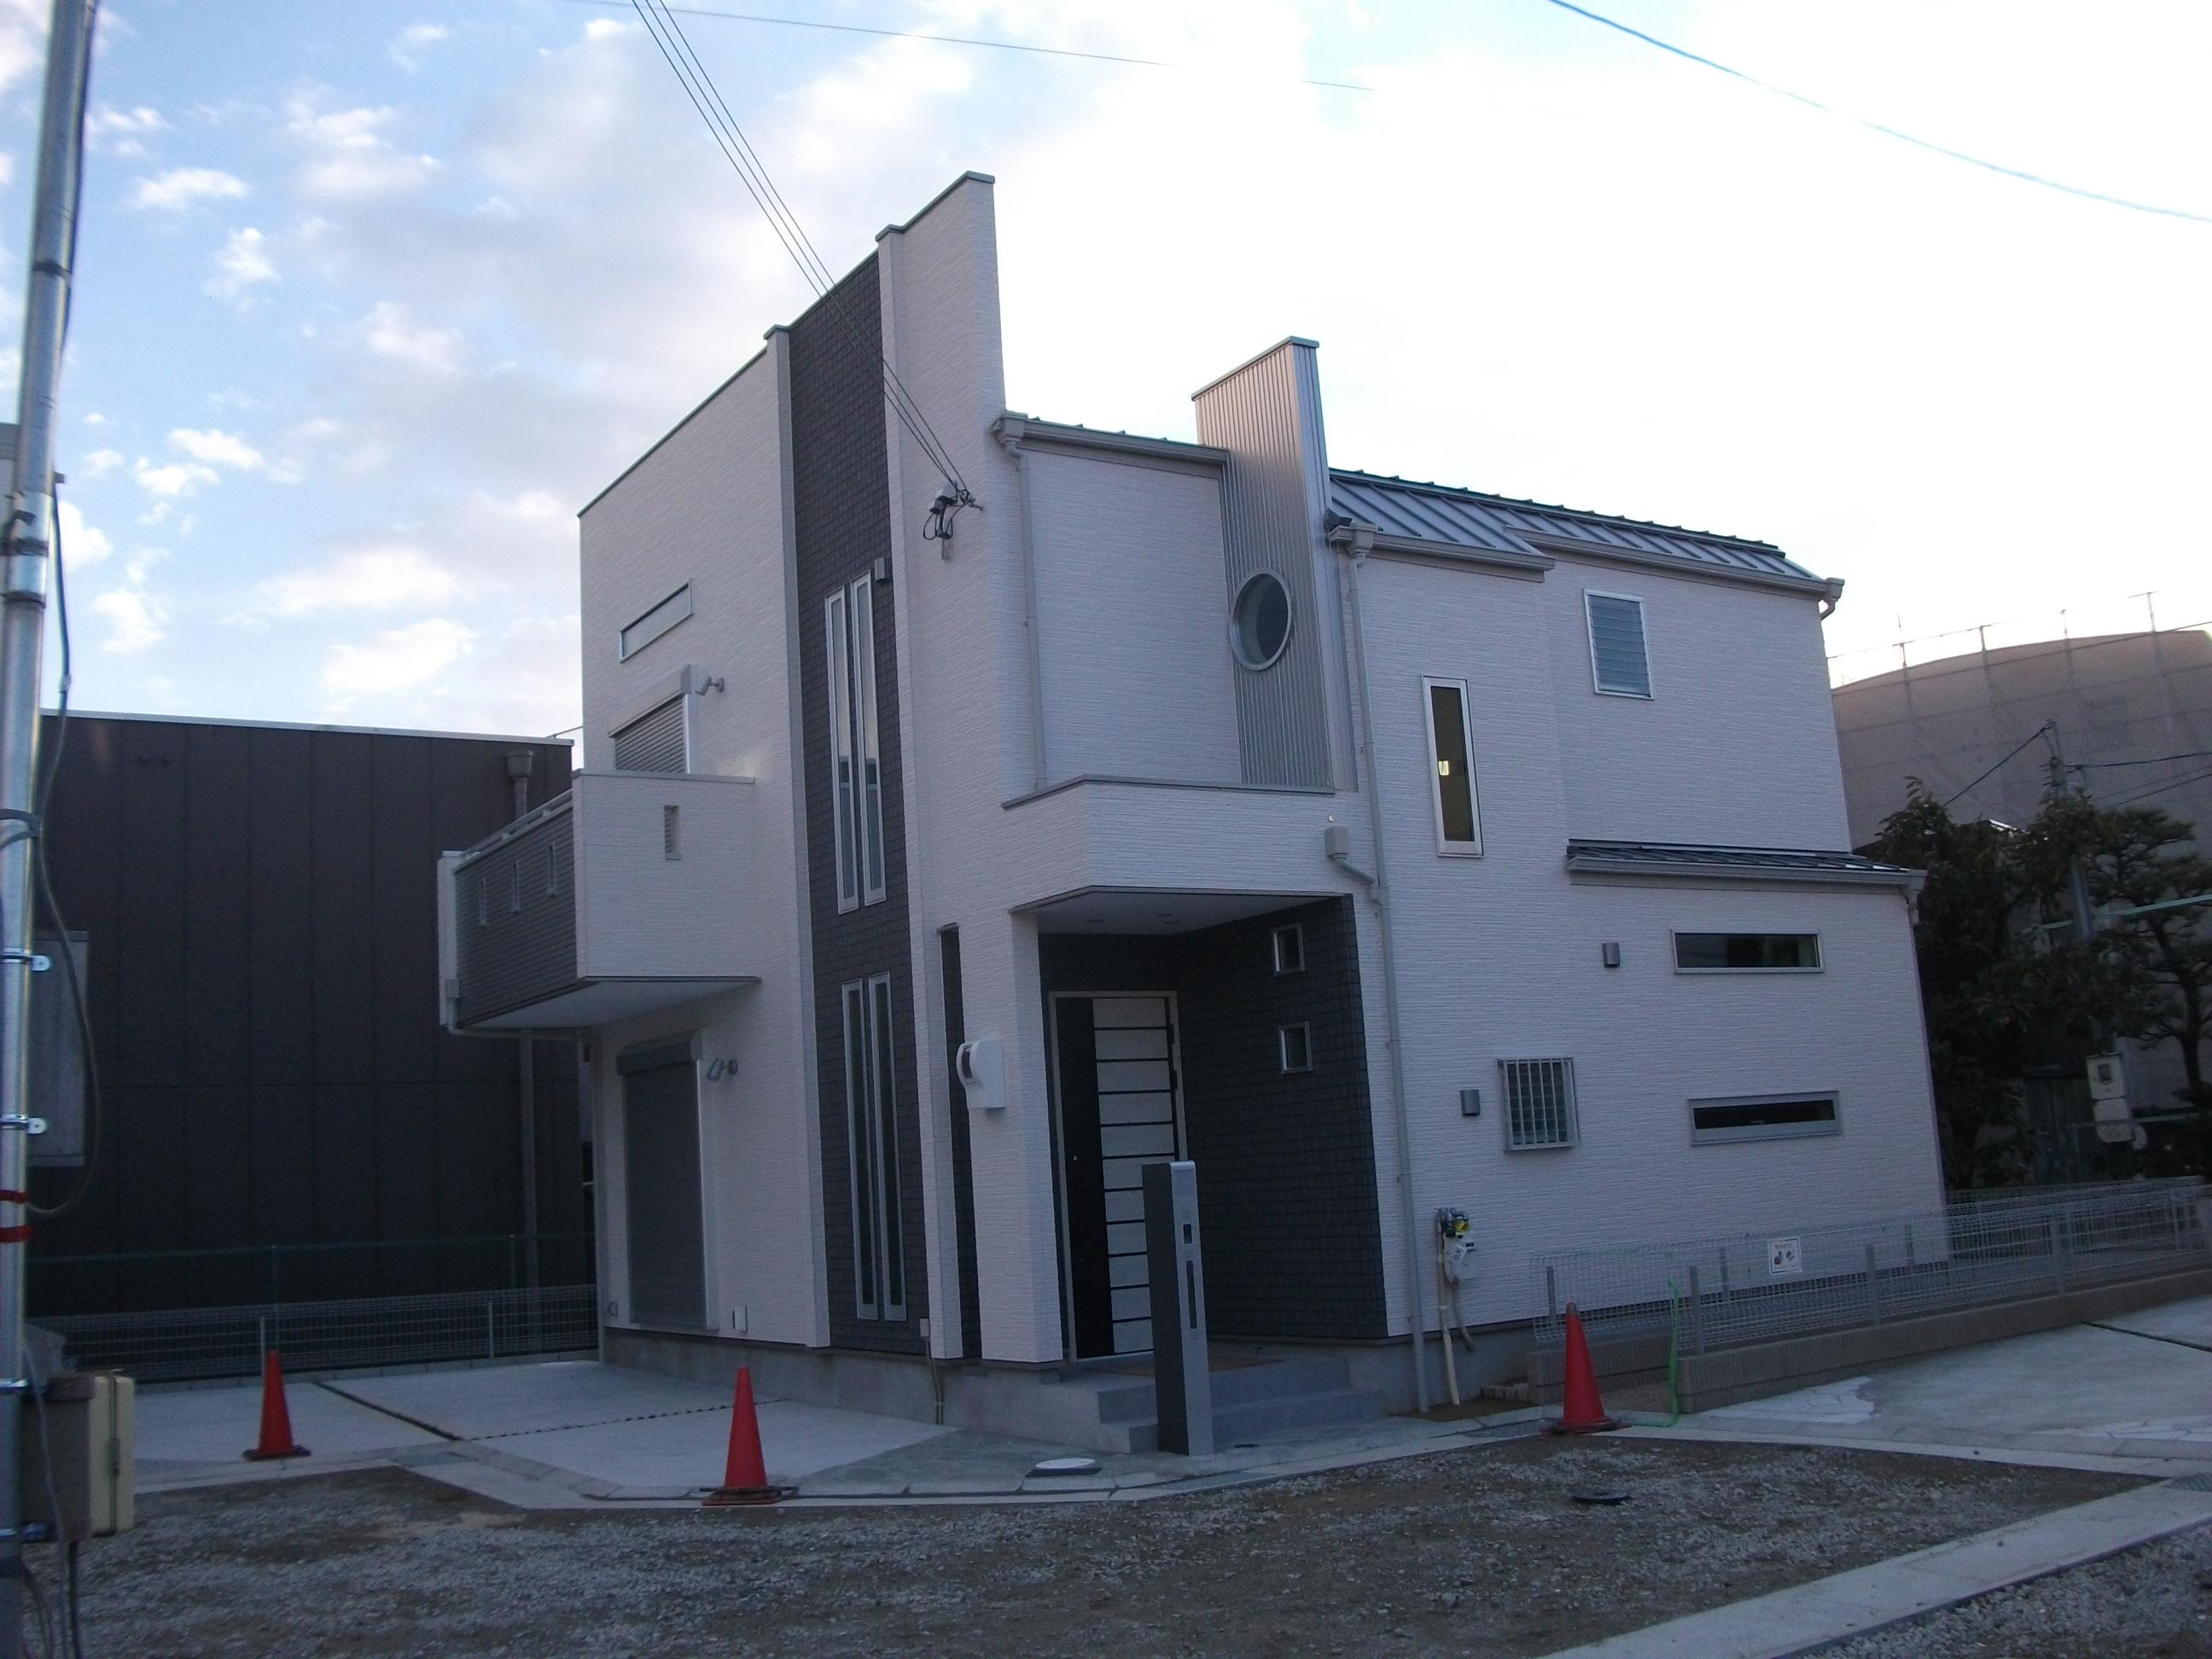 宝塚市 個人住宅新築工事イメージ01